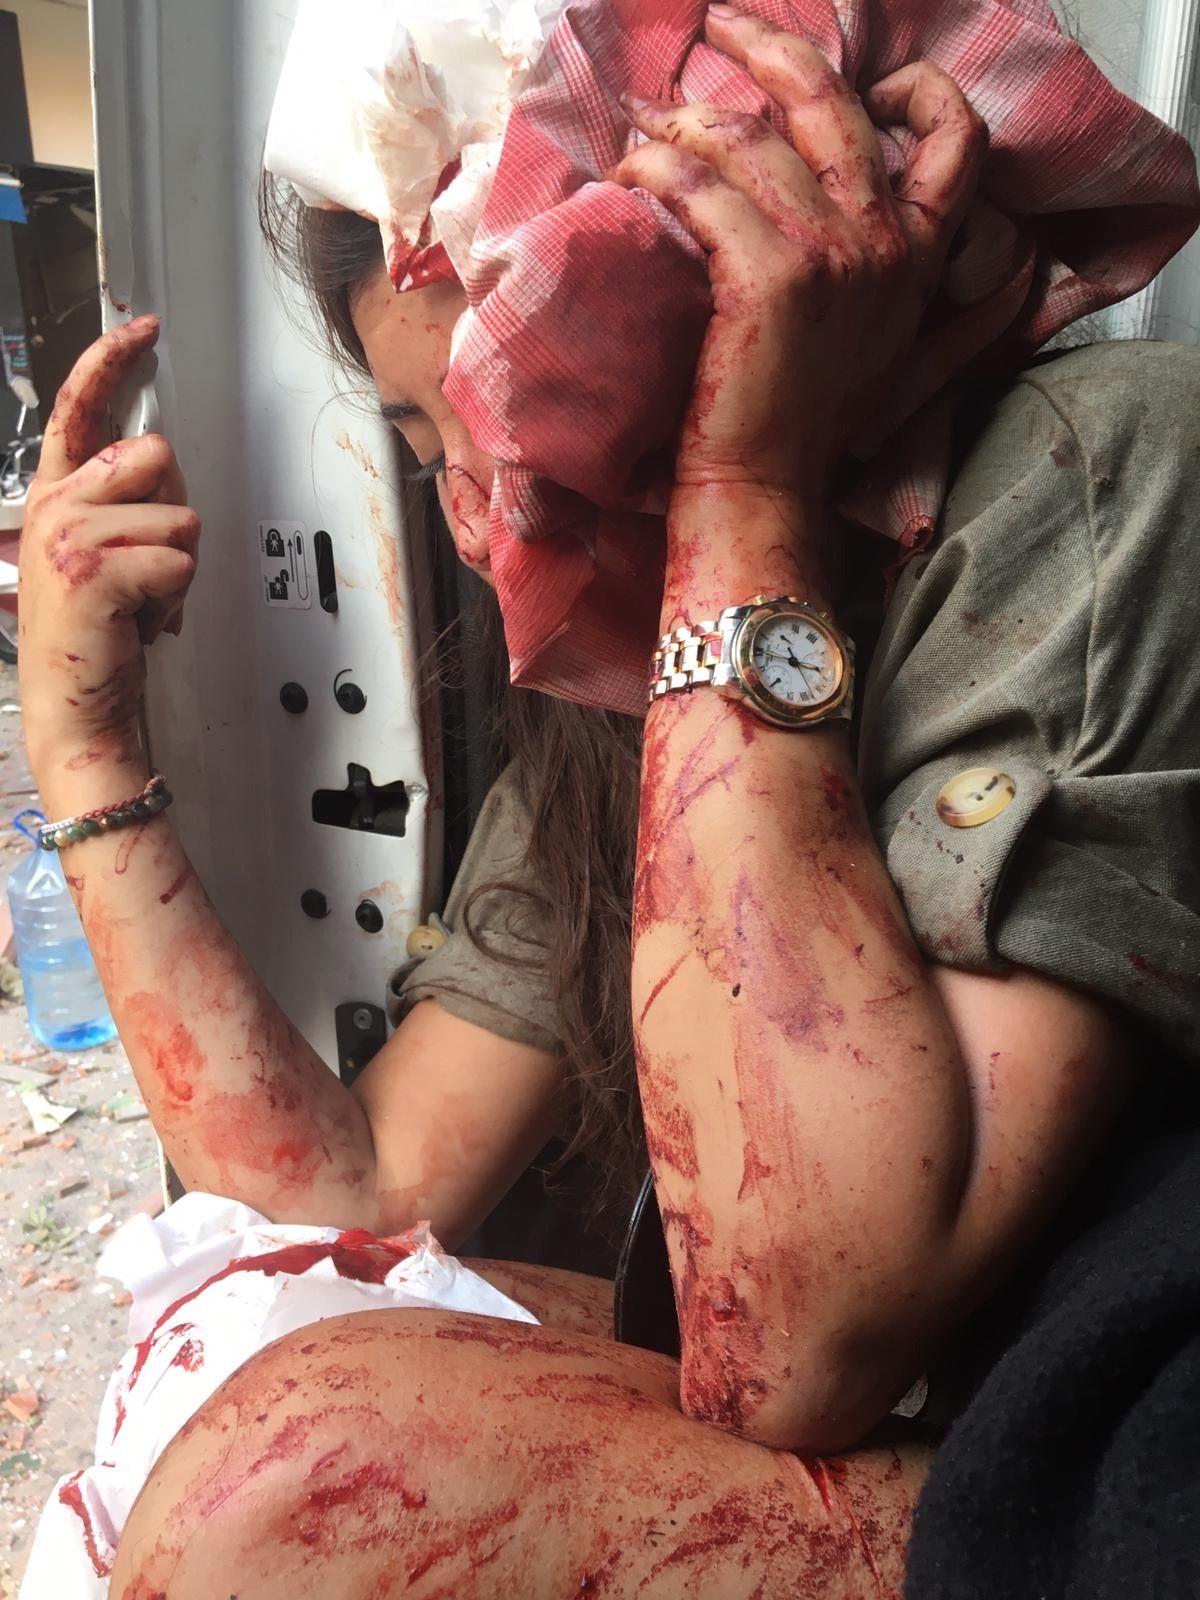 An injured woman riding in the ambulance, Beirut, August 4, 2020. Seema Jilani/Dion Nissenbaum